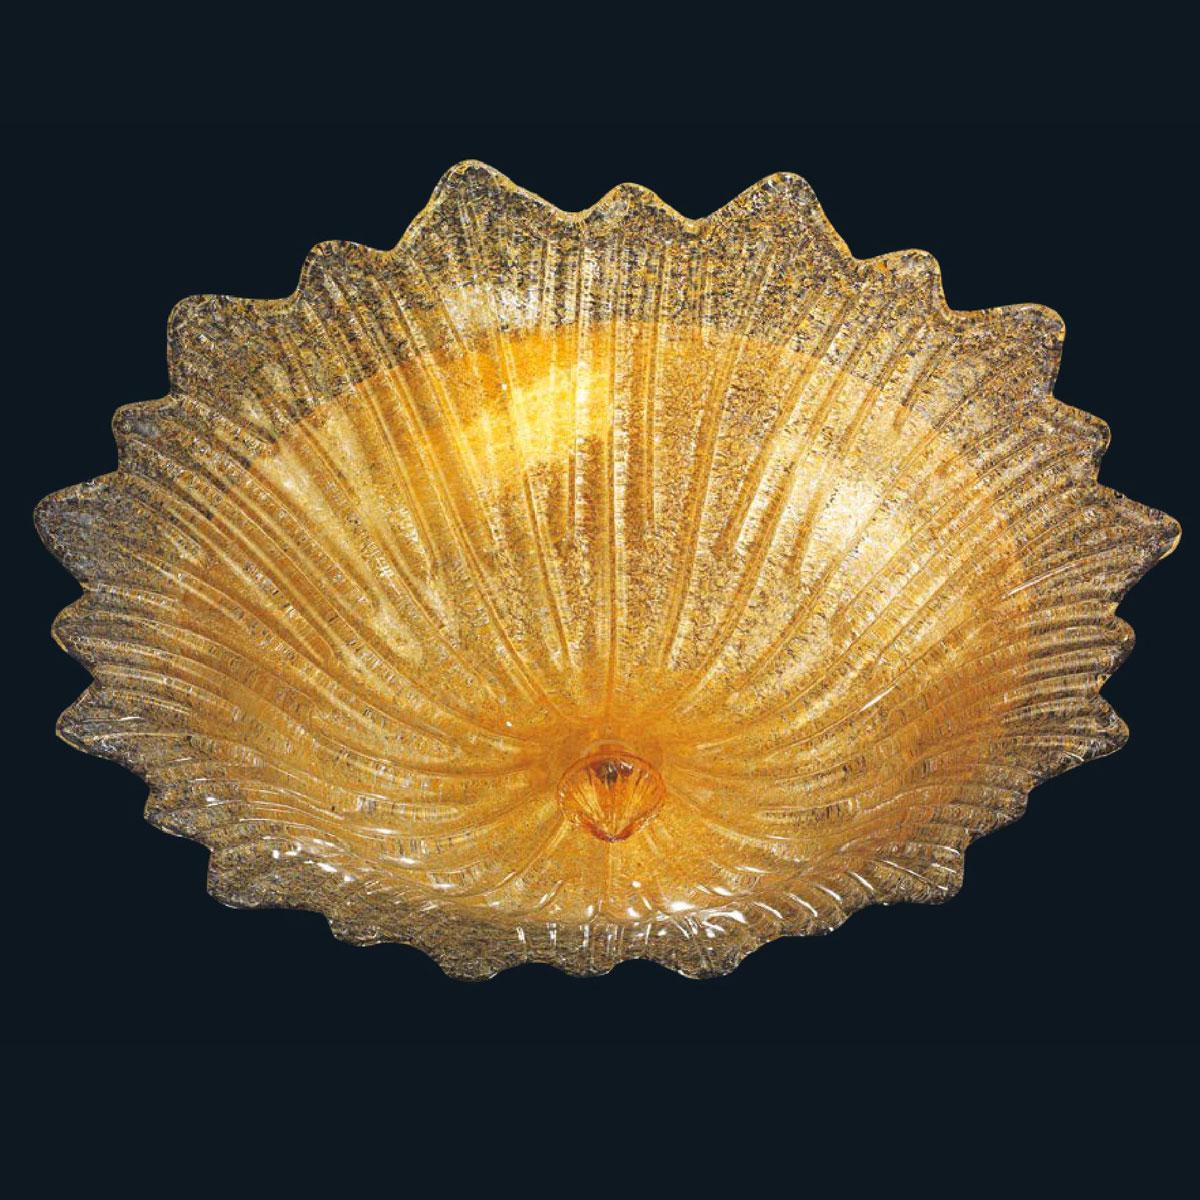 """Camille"" plafonnier en verre de Murano - 3 lumières - ambre"